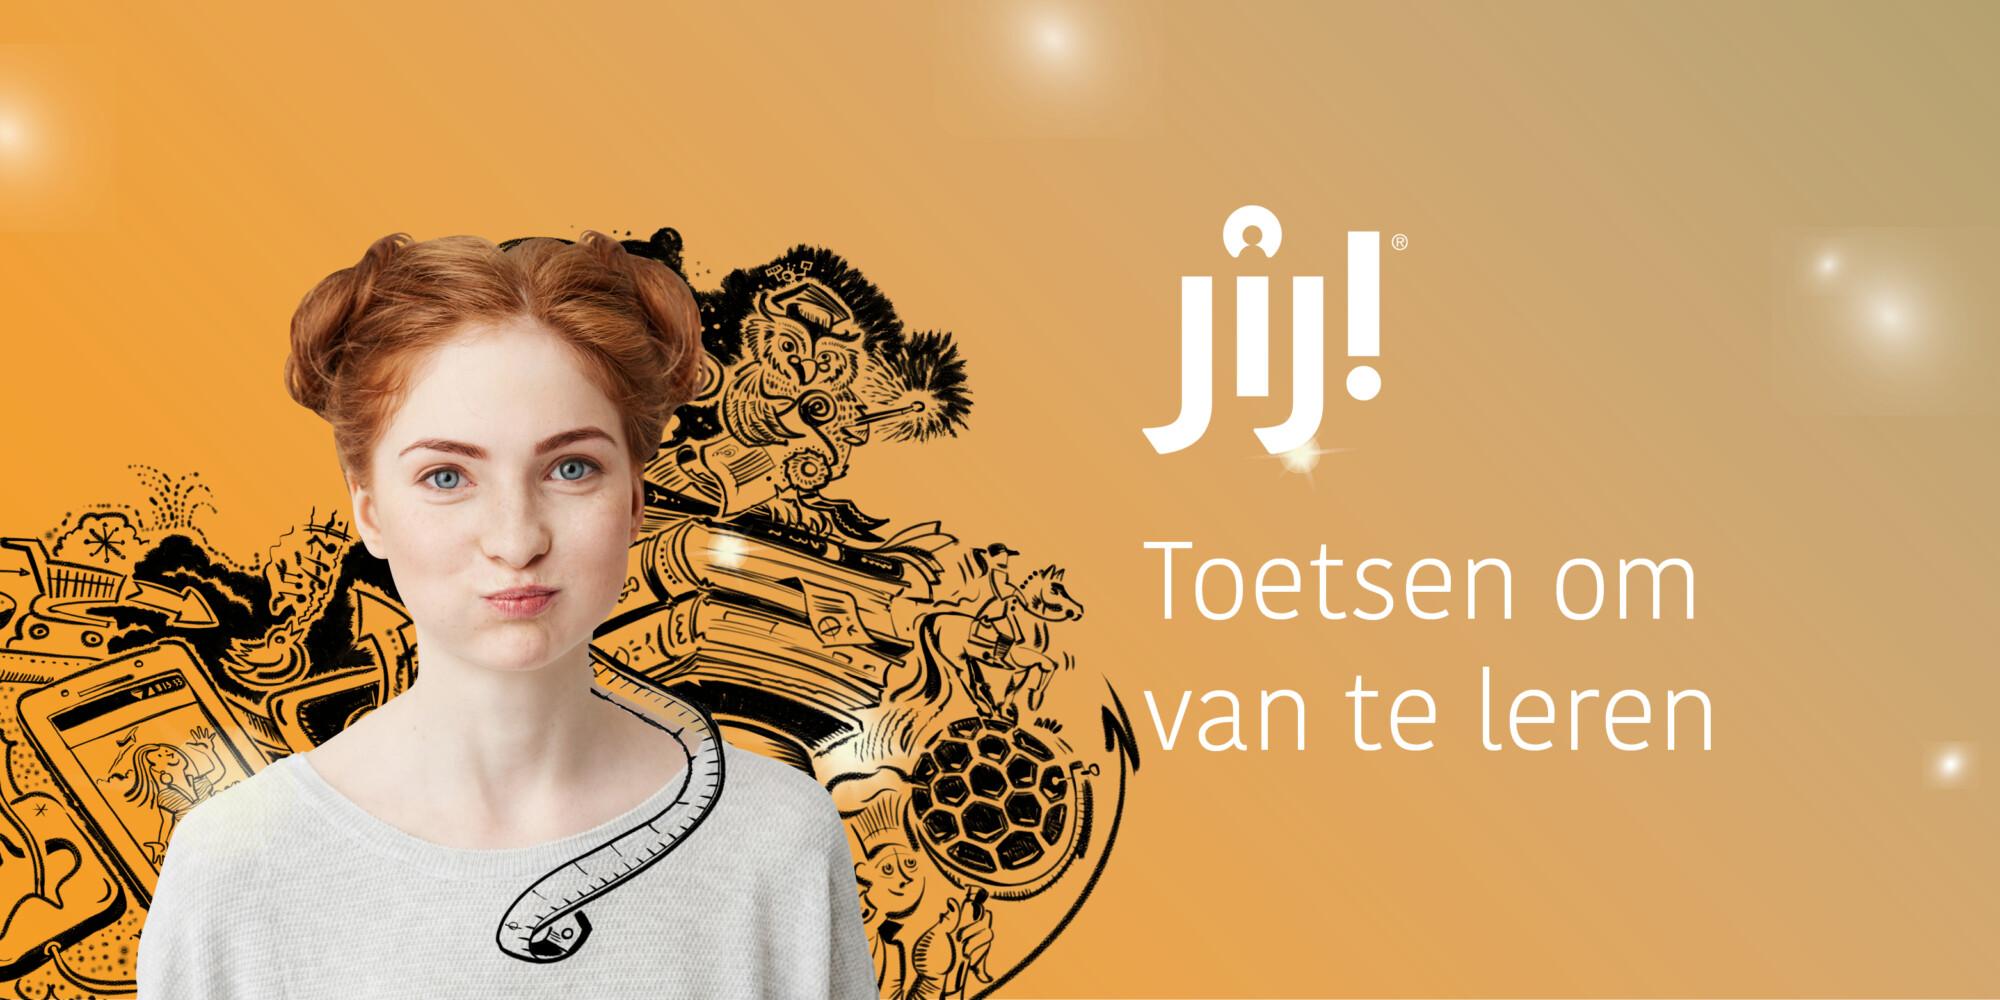 JIJ! Toetsing & Training - Toetsen om van te leren VO home mobiel 750 x 250 px